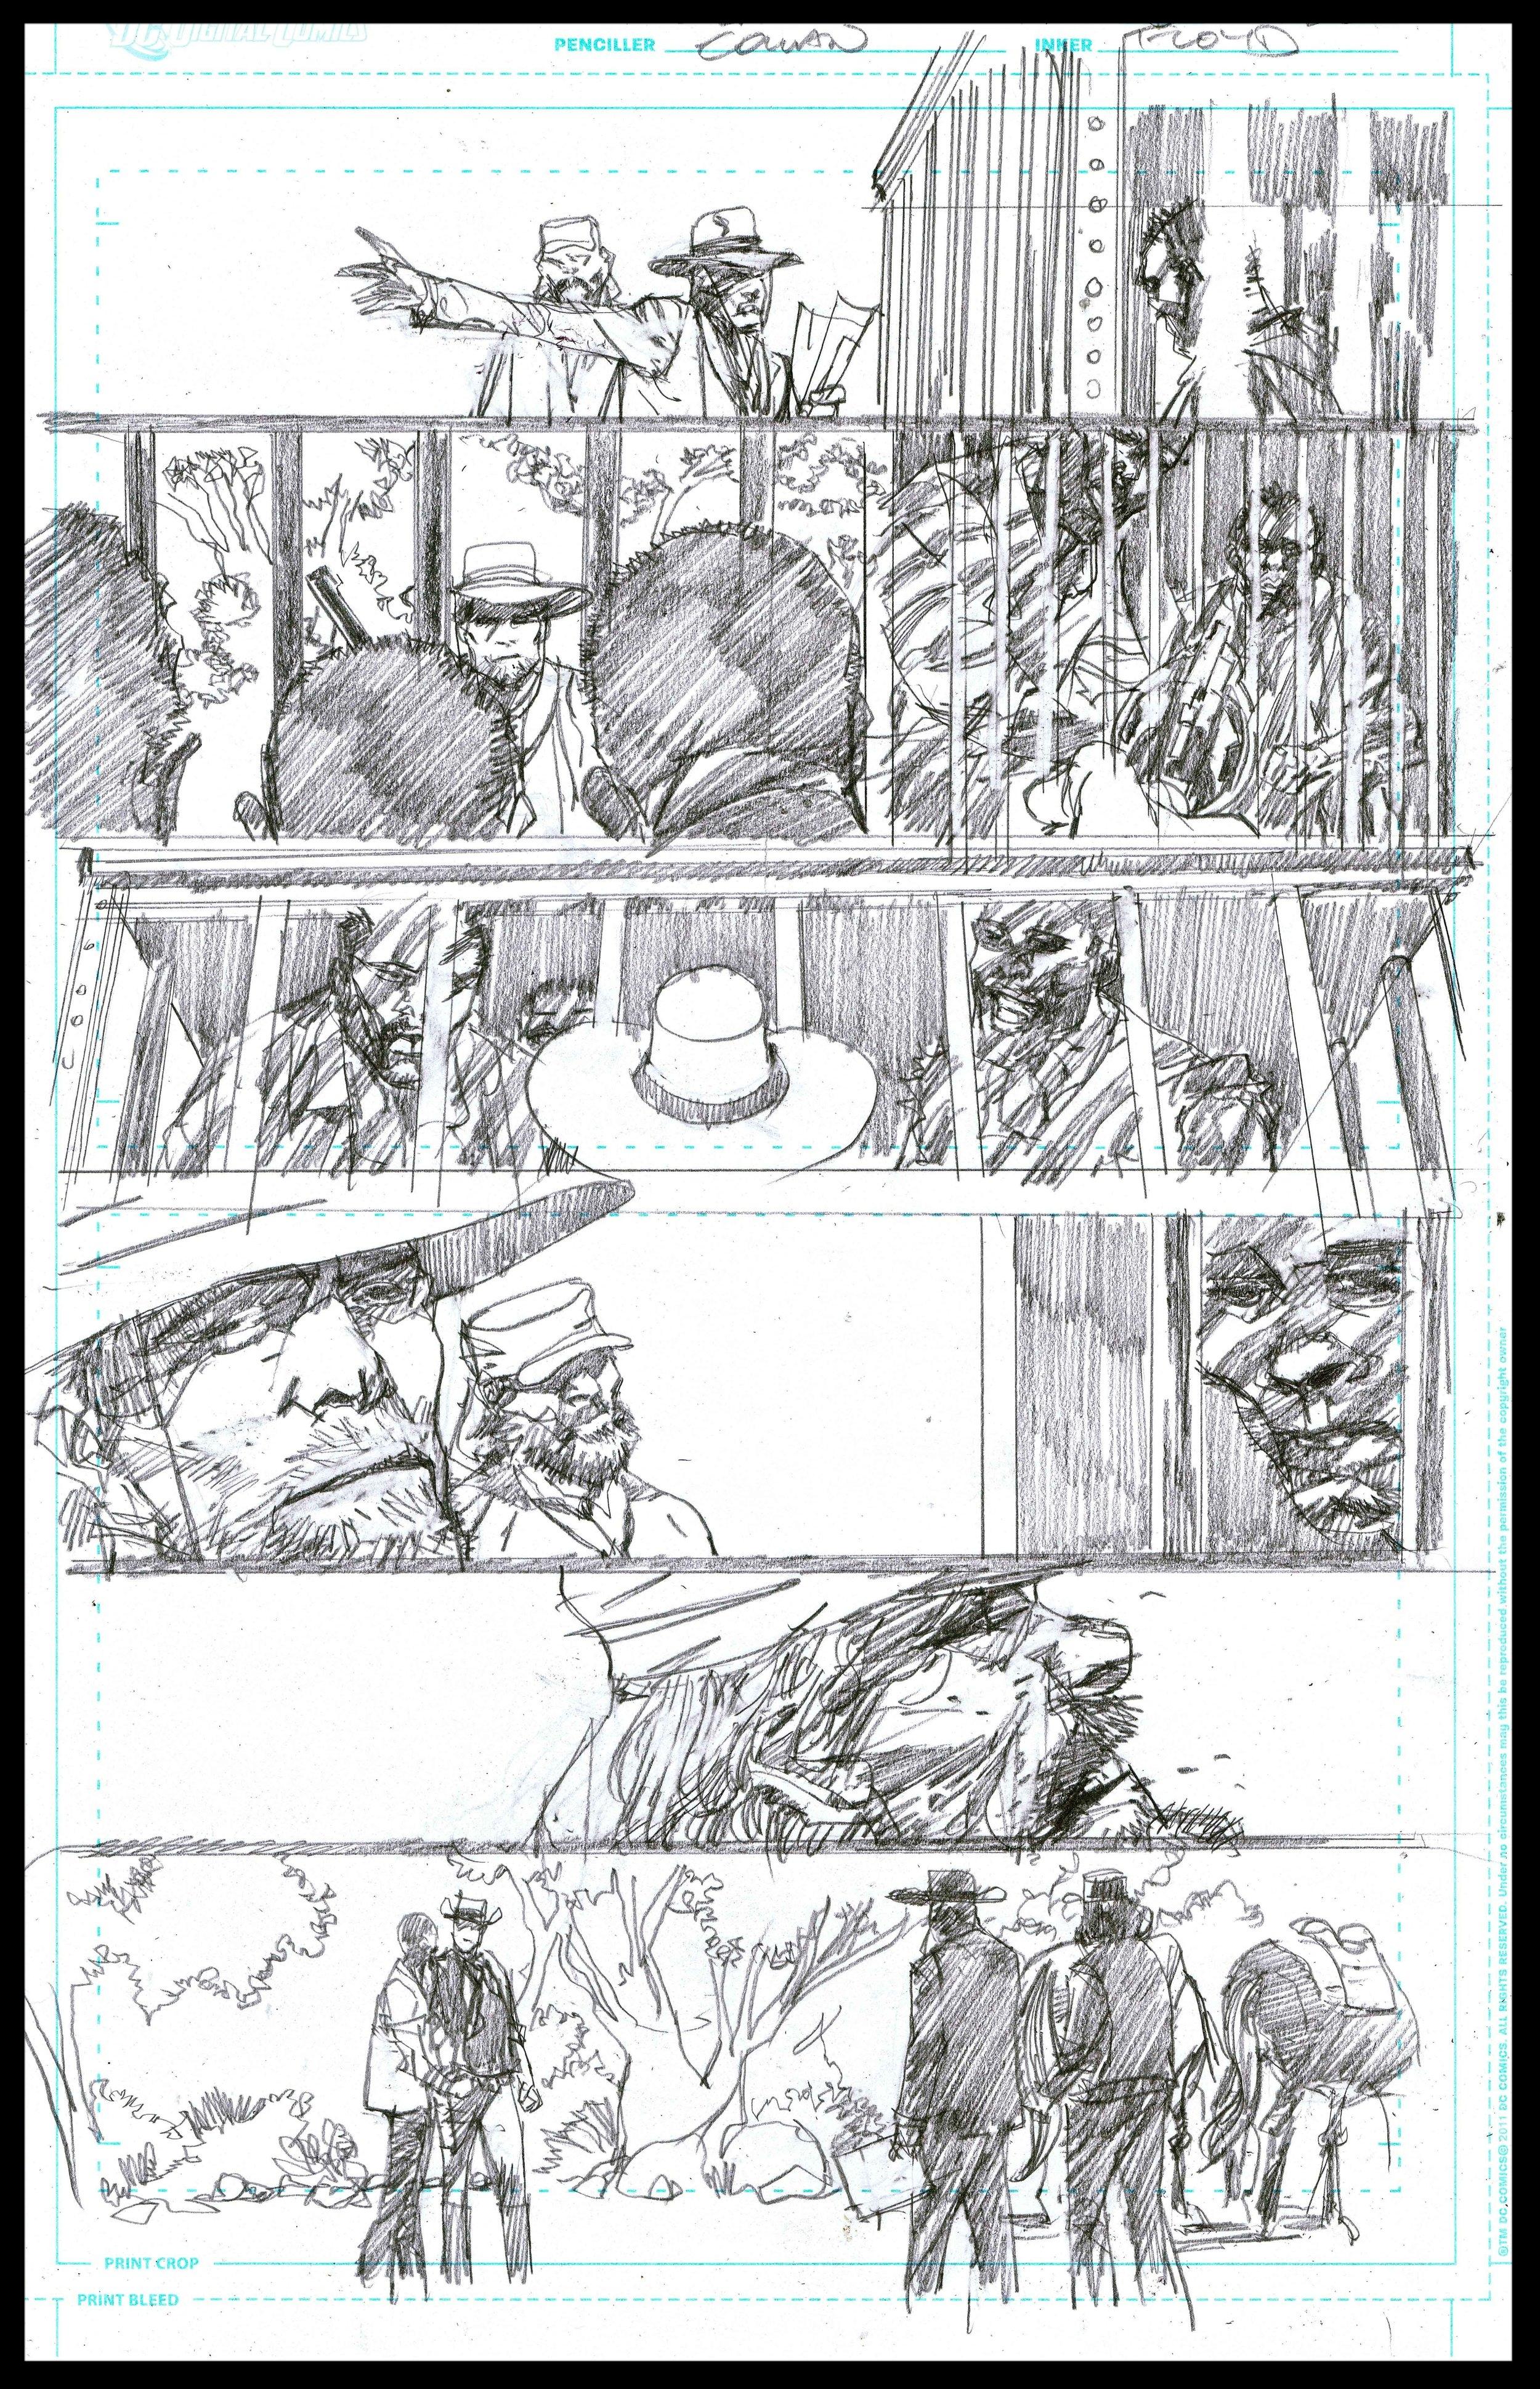 Django Unchained #6 - Page 38 - Pencils